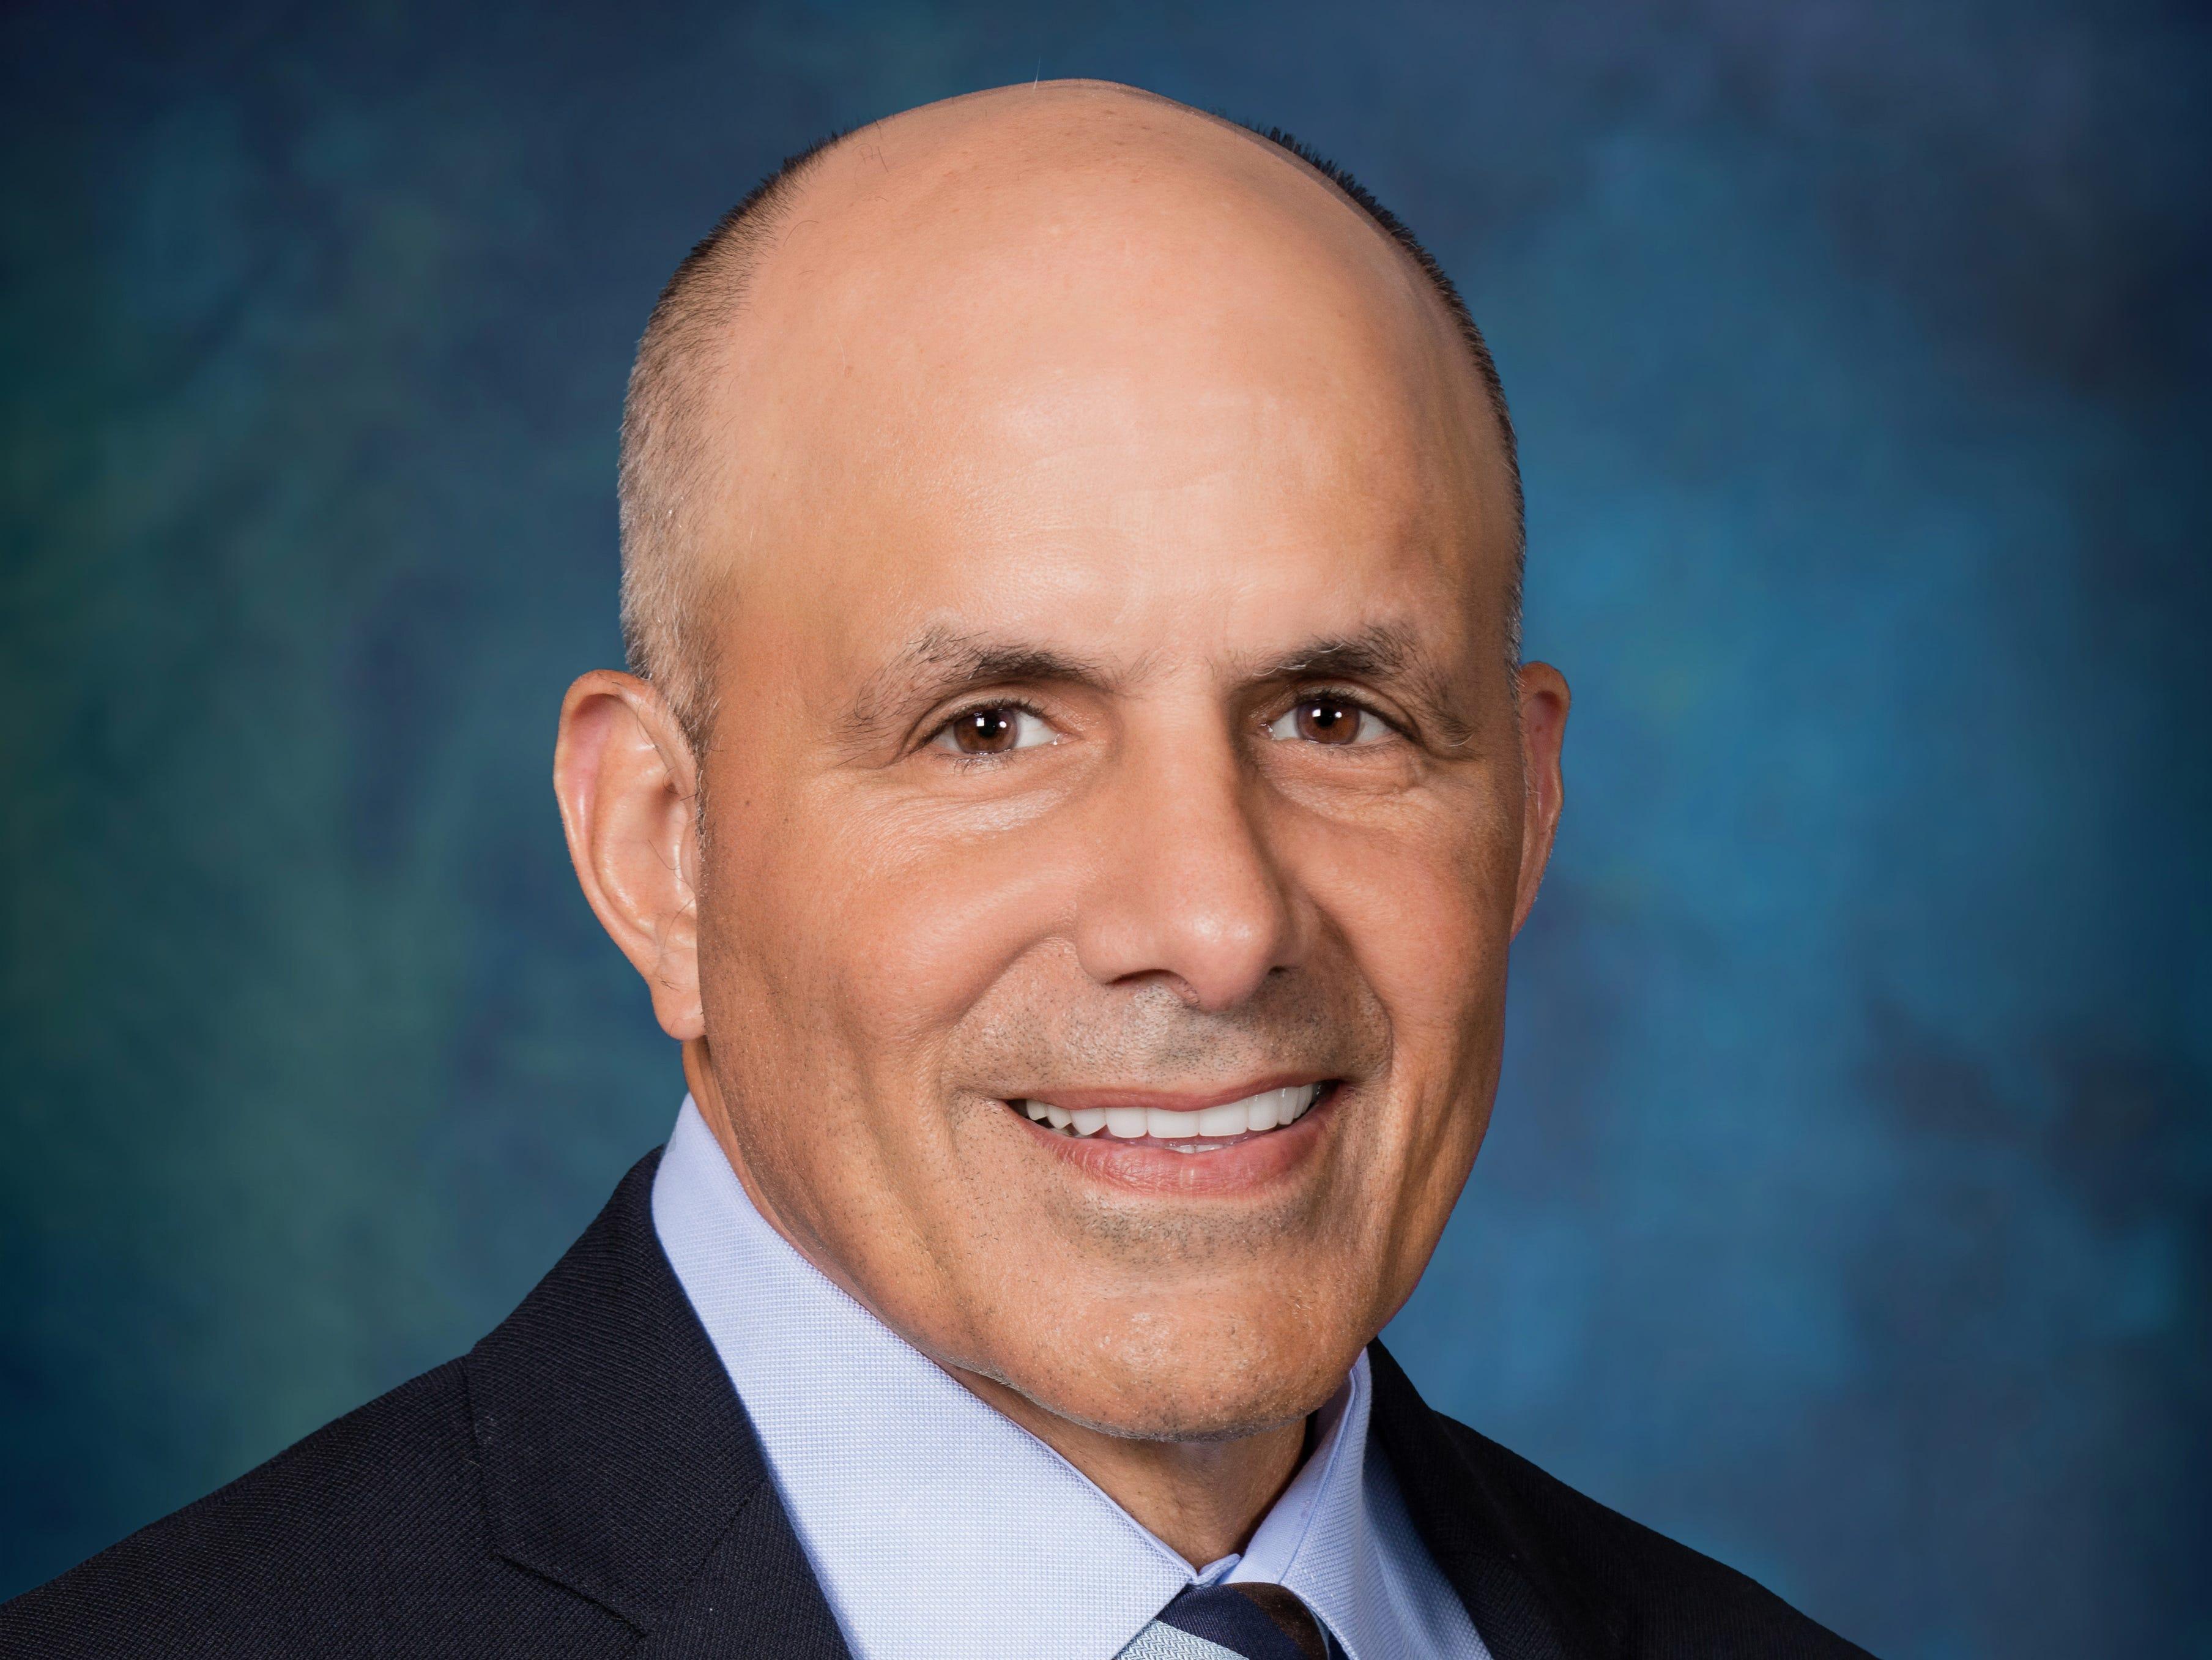 Avnet Inc.'s William Amelio (CEO): Summary compensation: $9,253,603. Adjusted compensation: $1,280,109. TTM profit: $134 million. TTM revenue: $18.6 billion. 2017 stock: (15.3  percent). Capitalization: $5.2 billion.